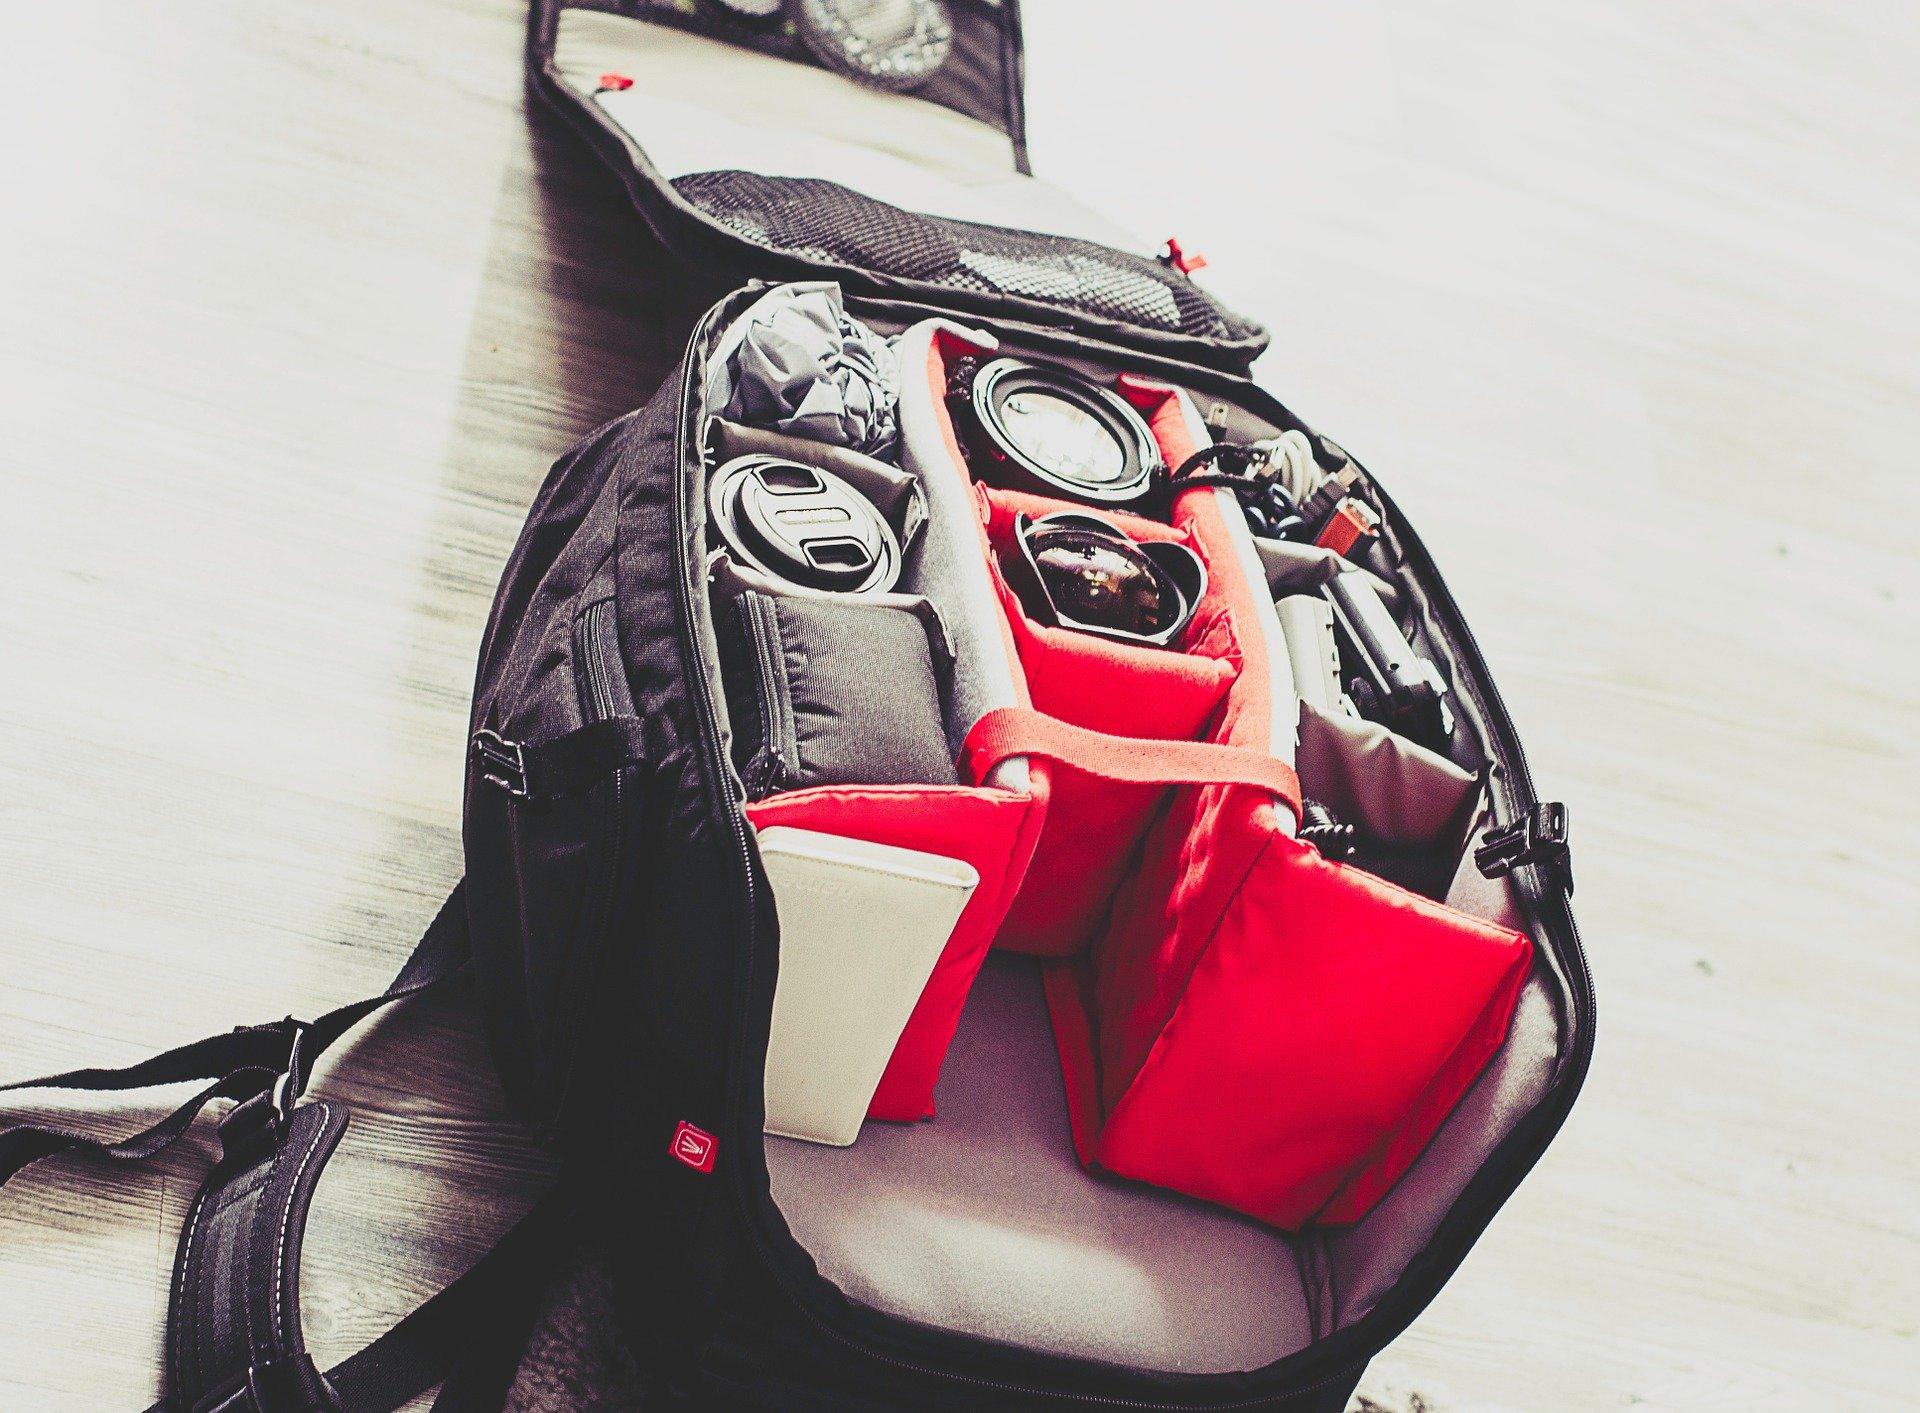 Notfallrucksack, Bug out Bag, INCH Bag